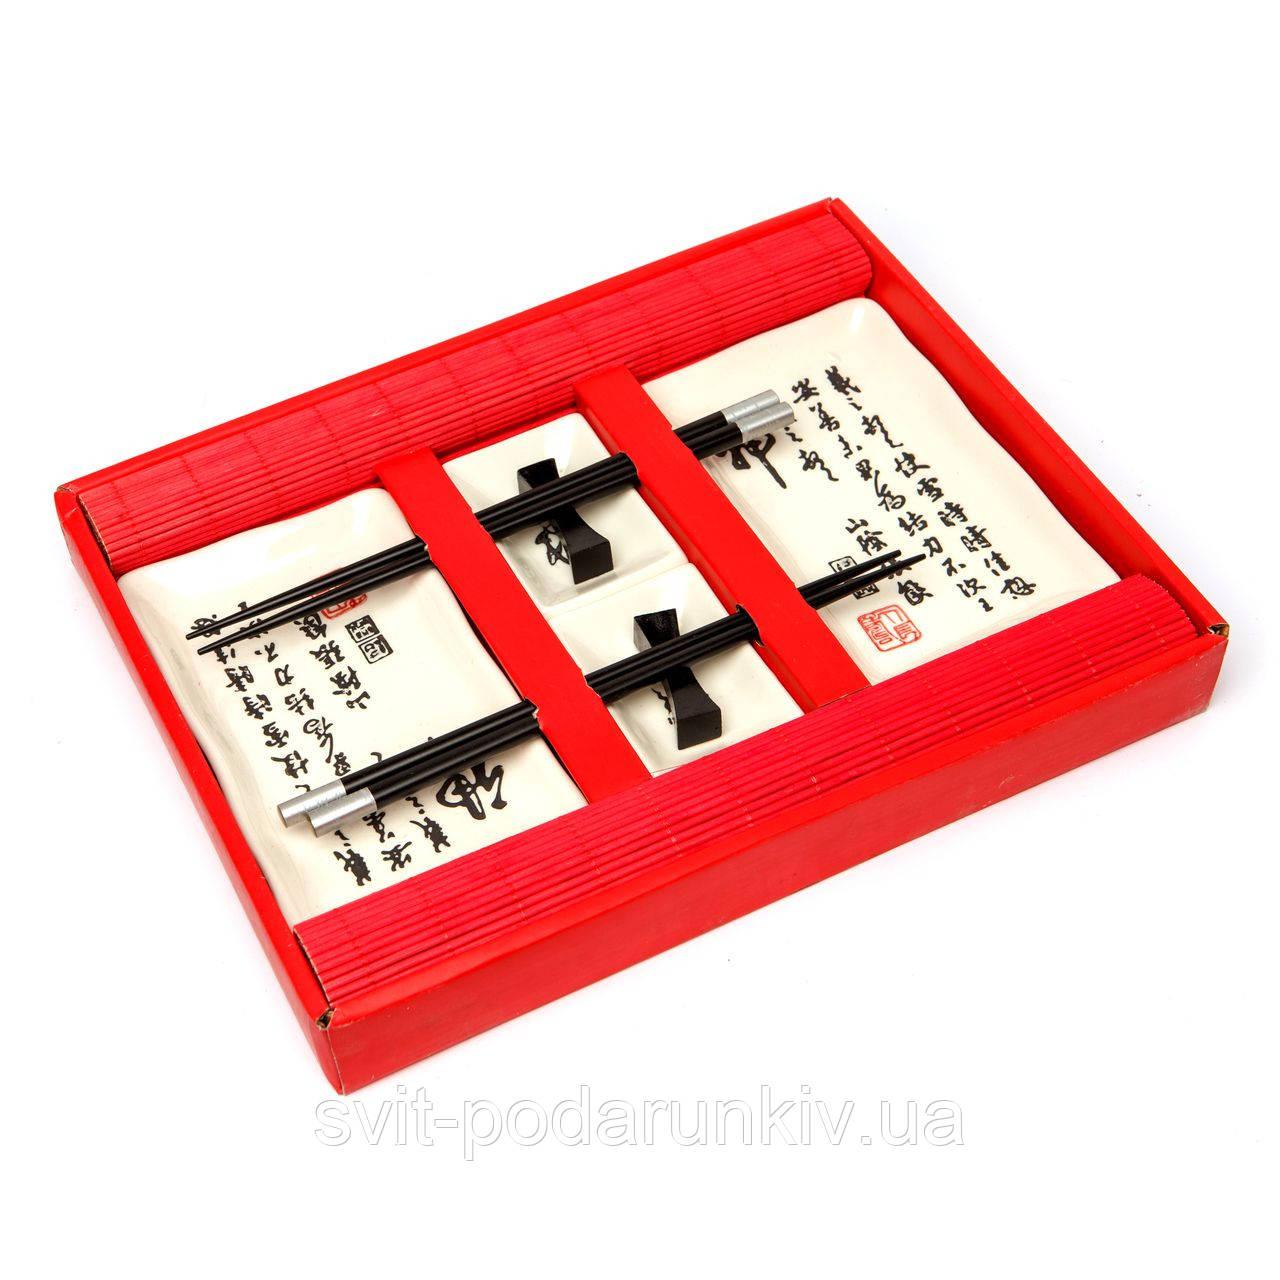 Посуда для суши с иероглифами S52181-1